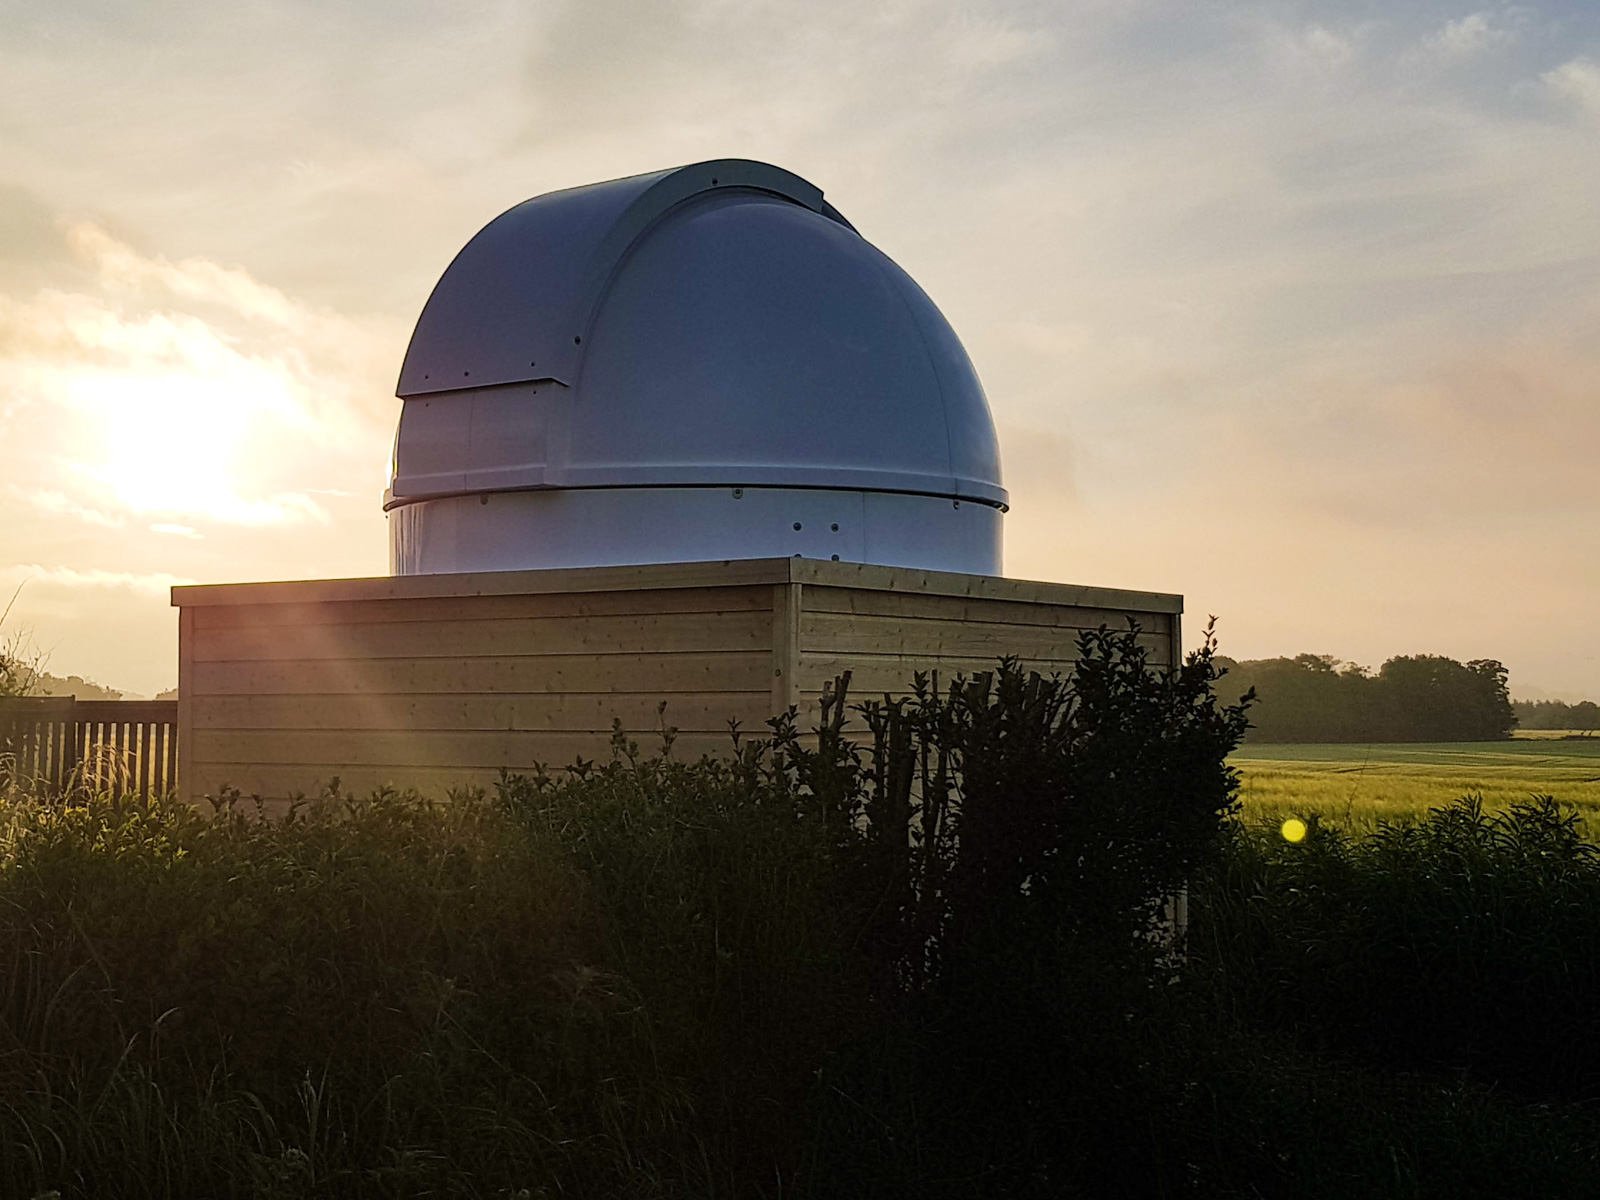 Observatory complete